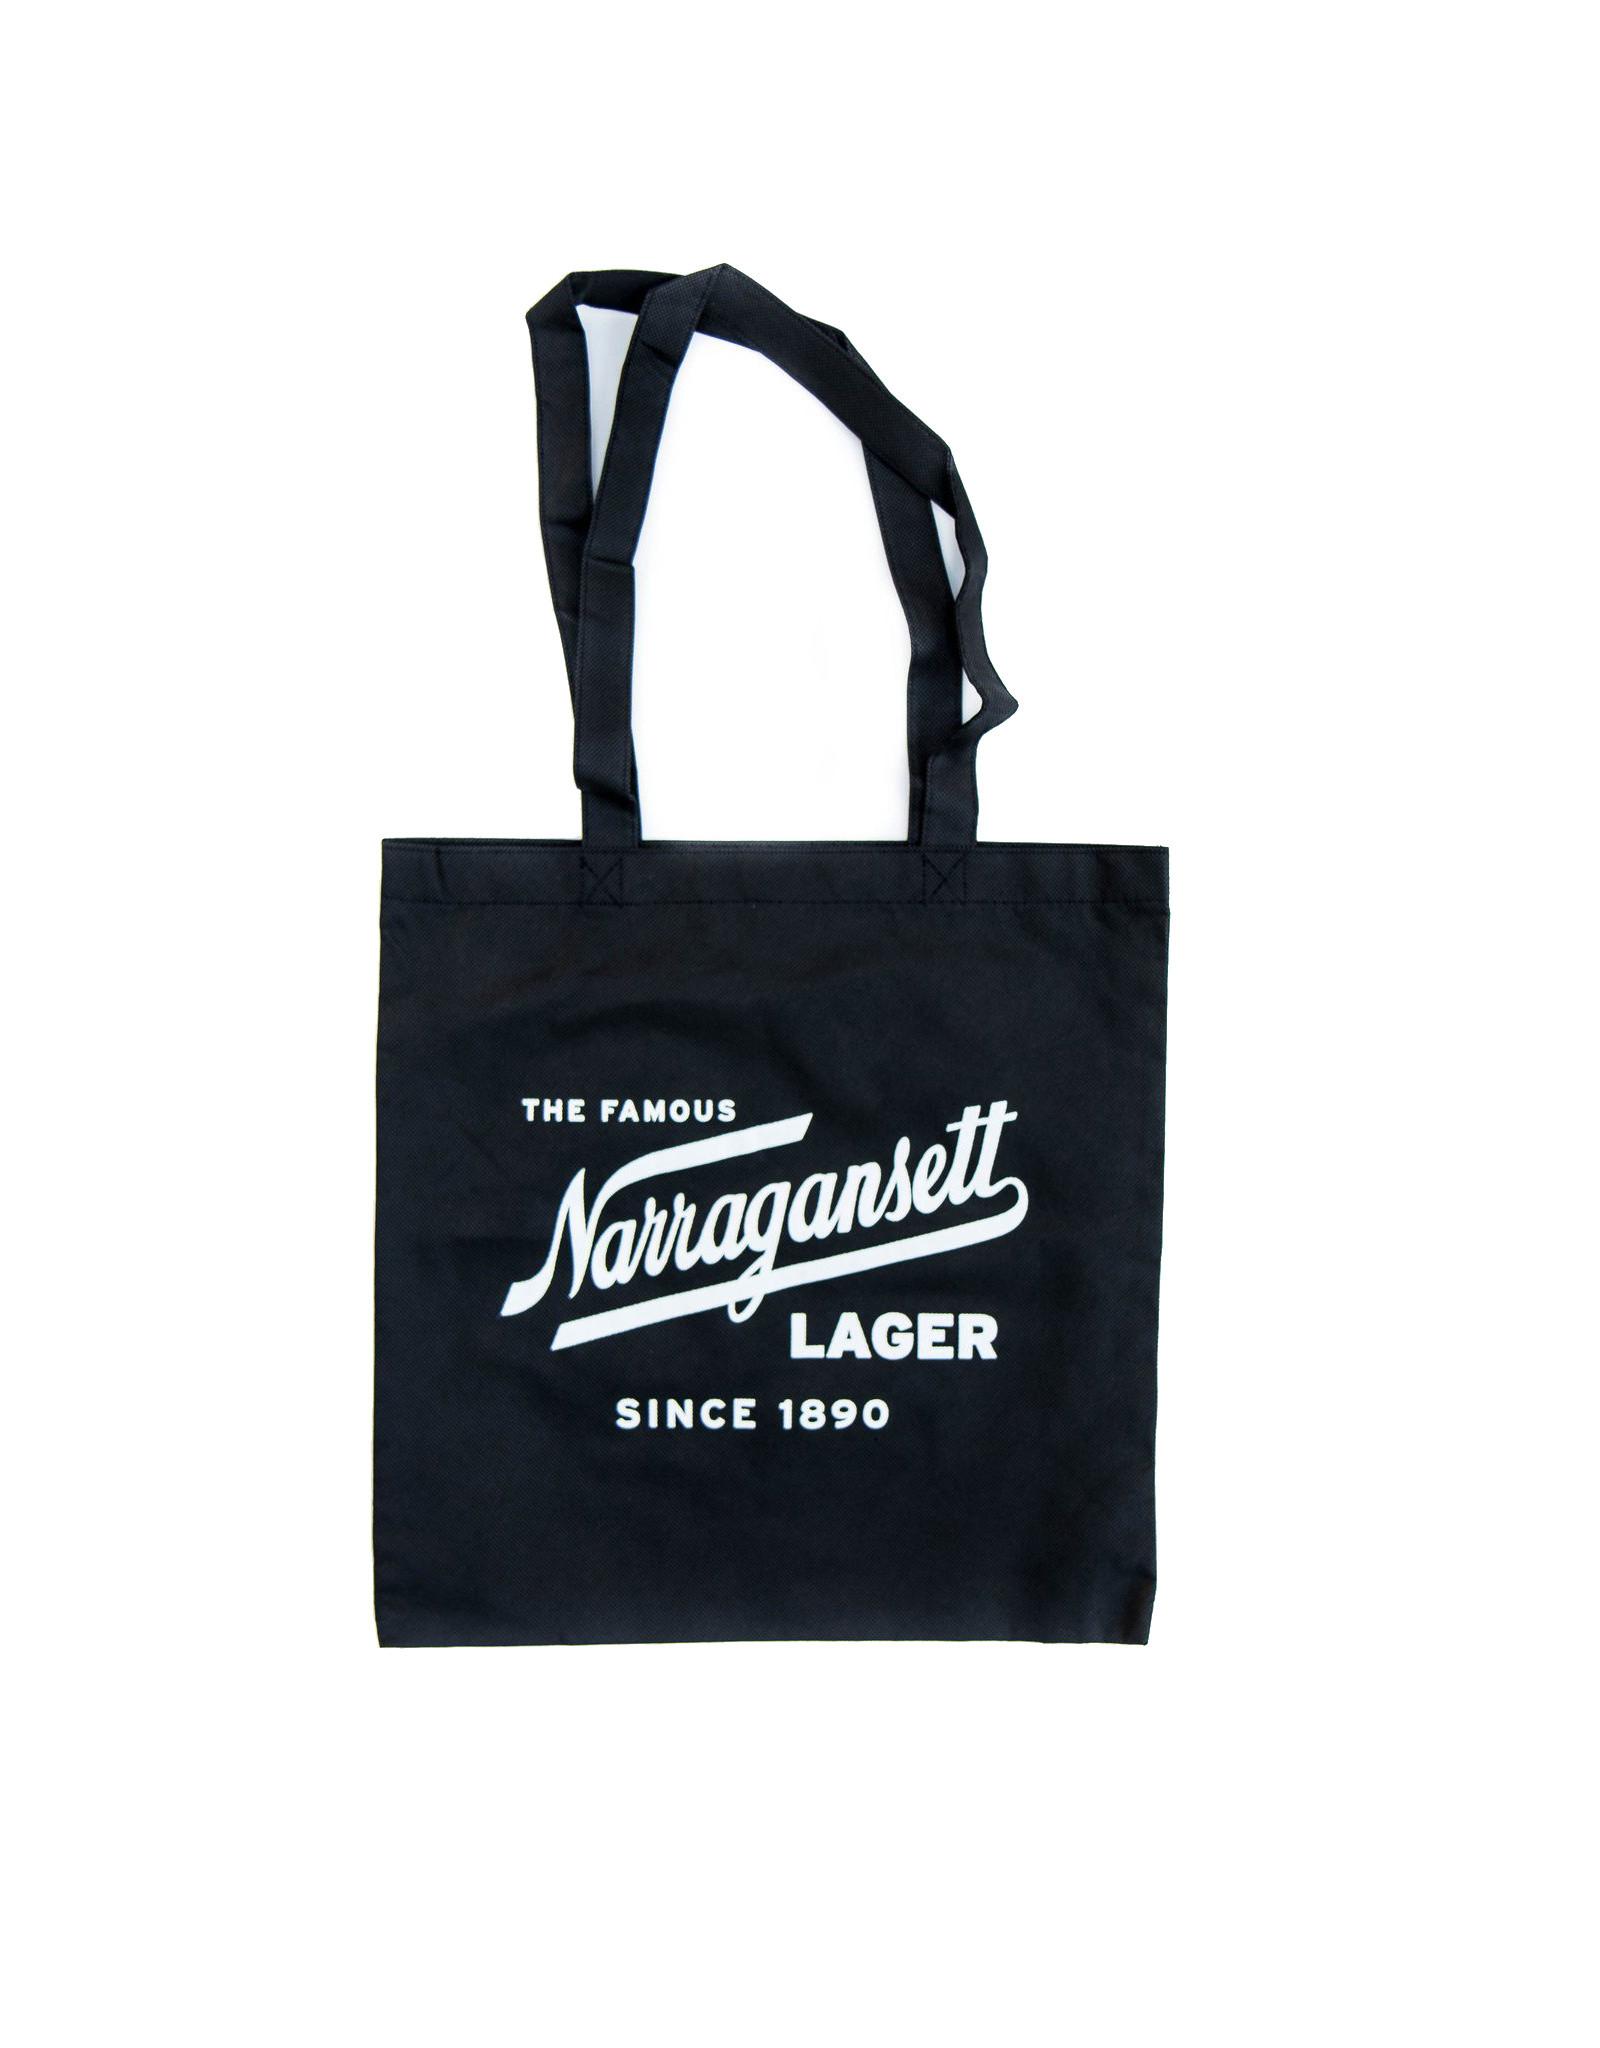 Narragansett Tote